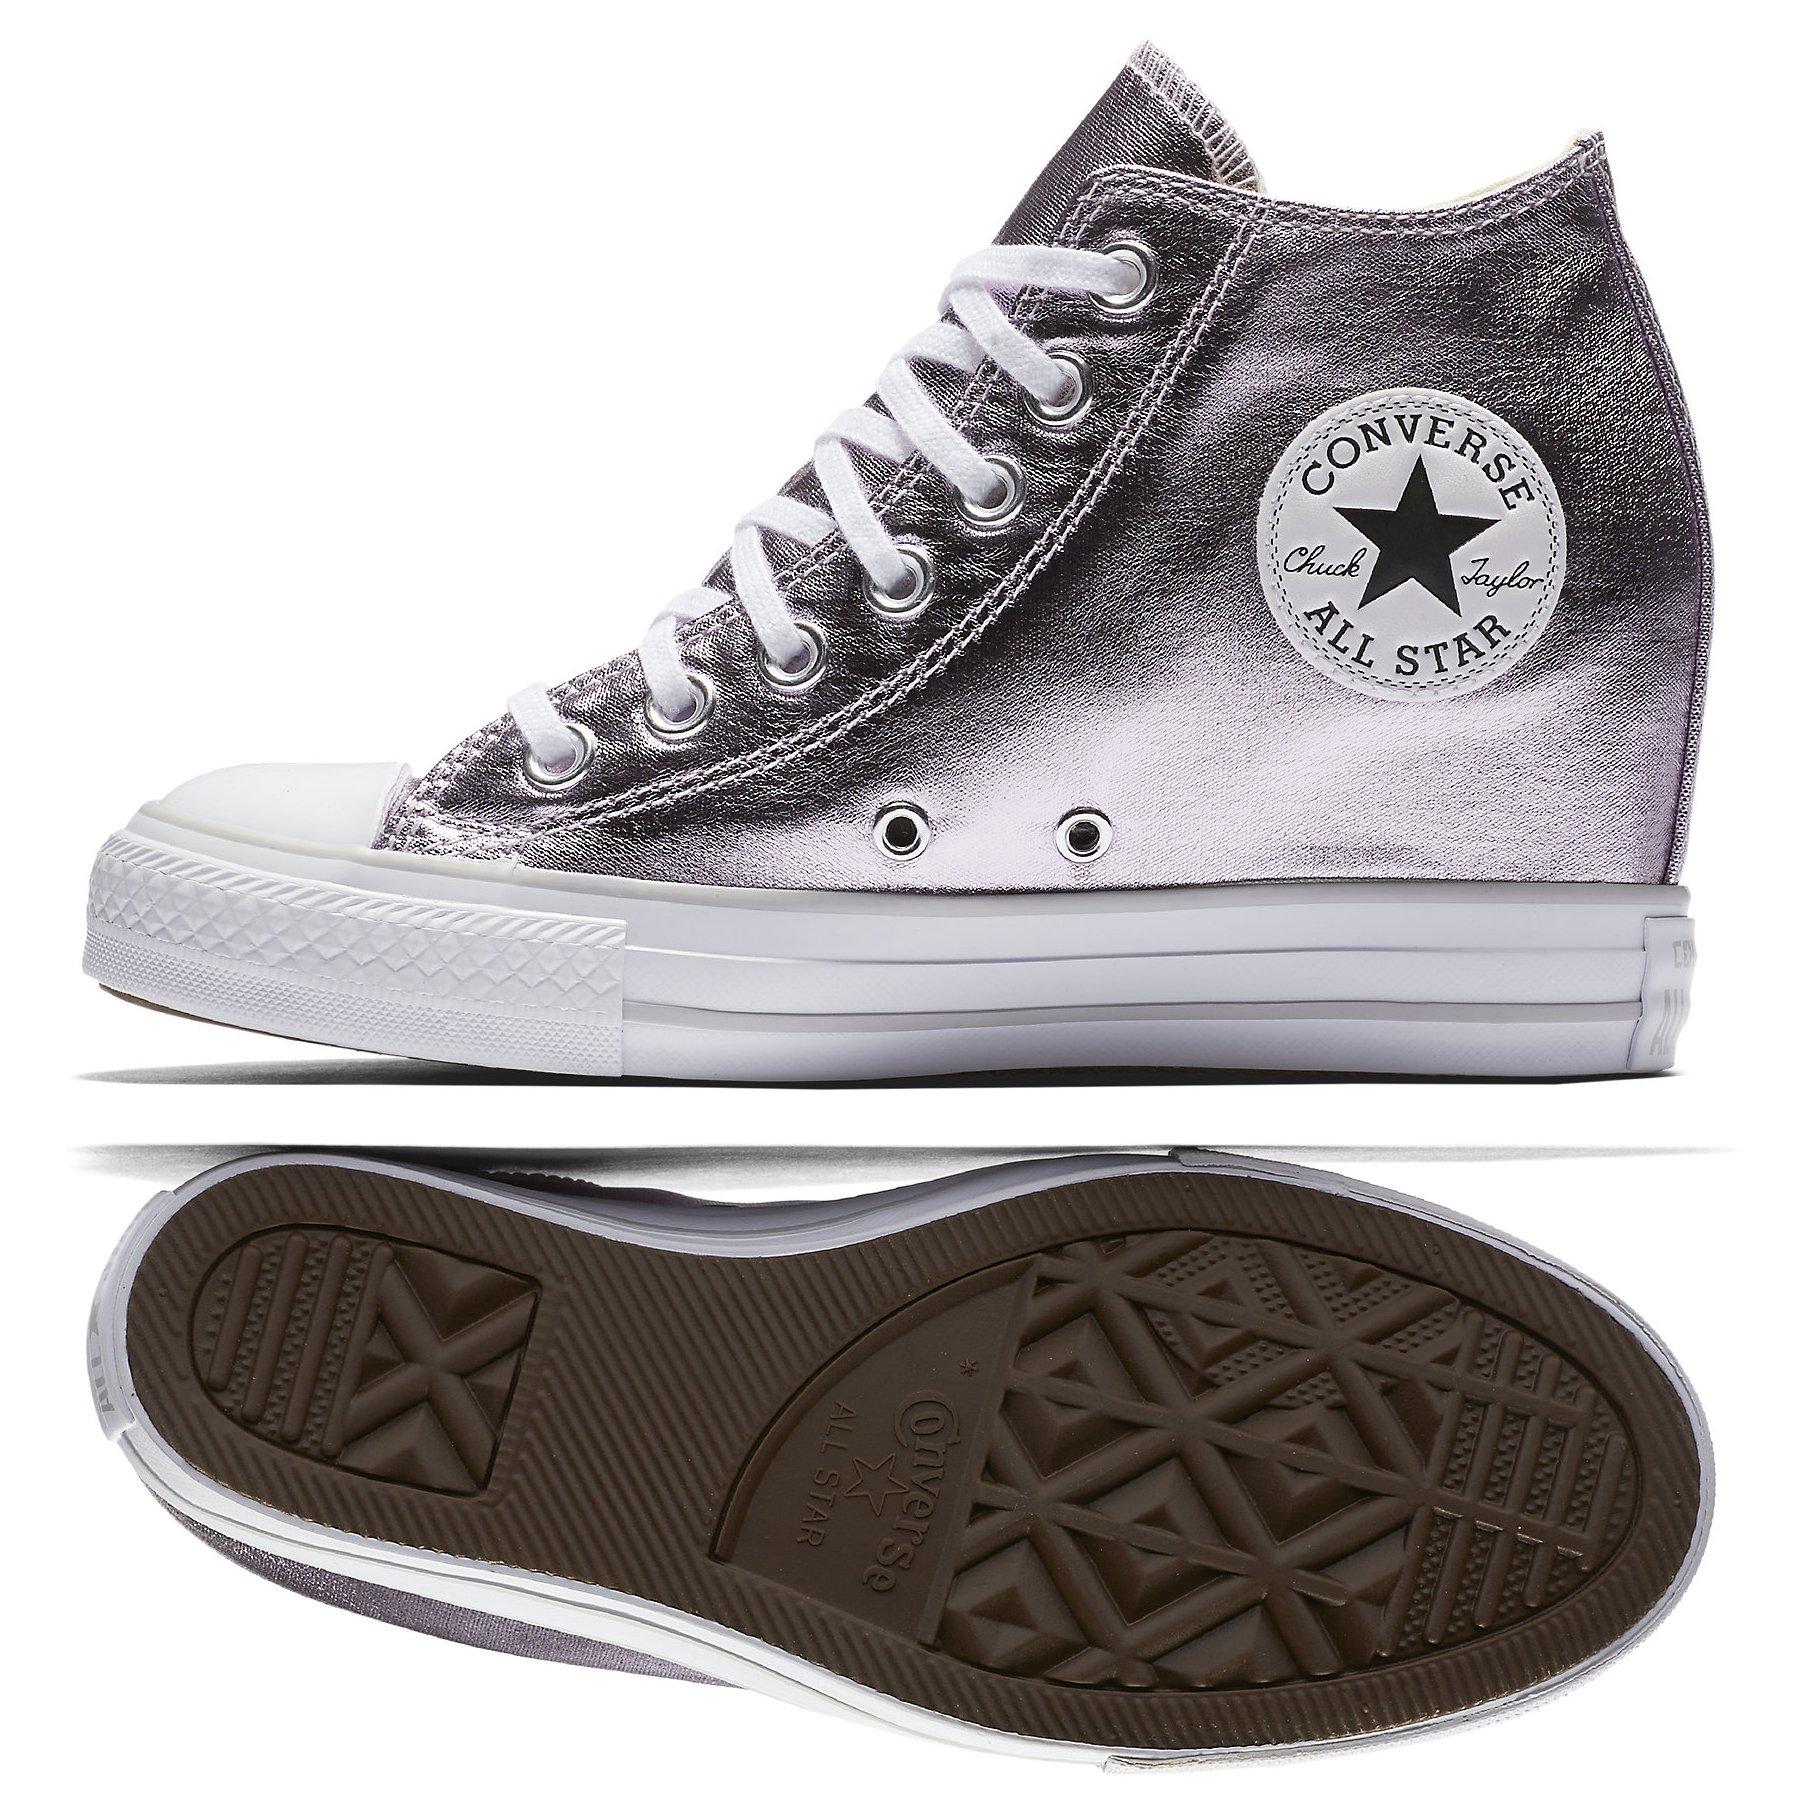 b57865e6d157 Galleon - Converse Womens Chuck Taylor Lux Wedge Sneaker Metallic (6.5 B  US)